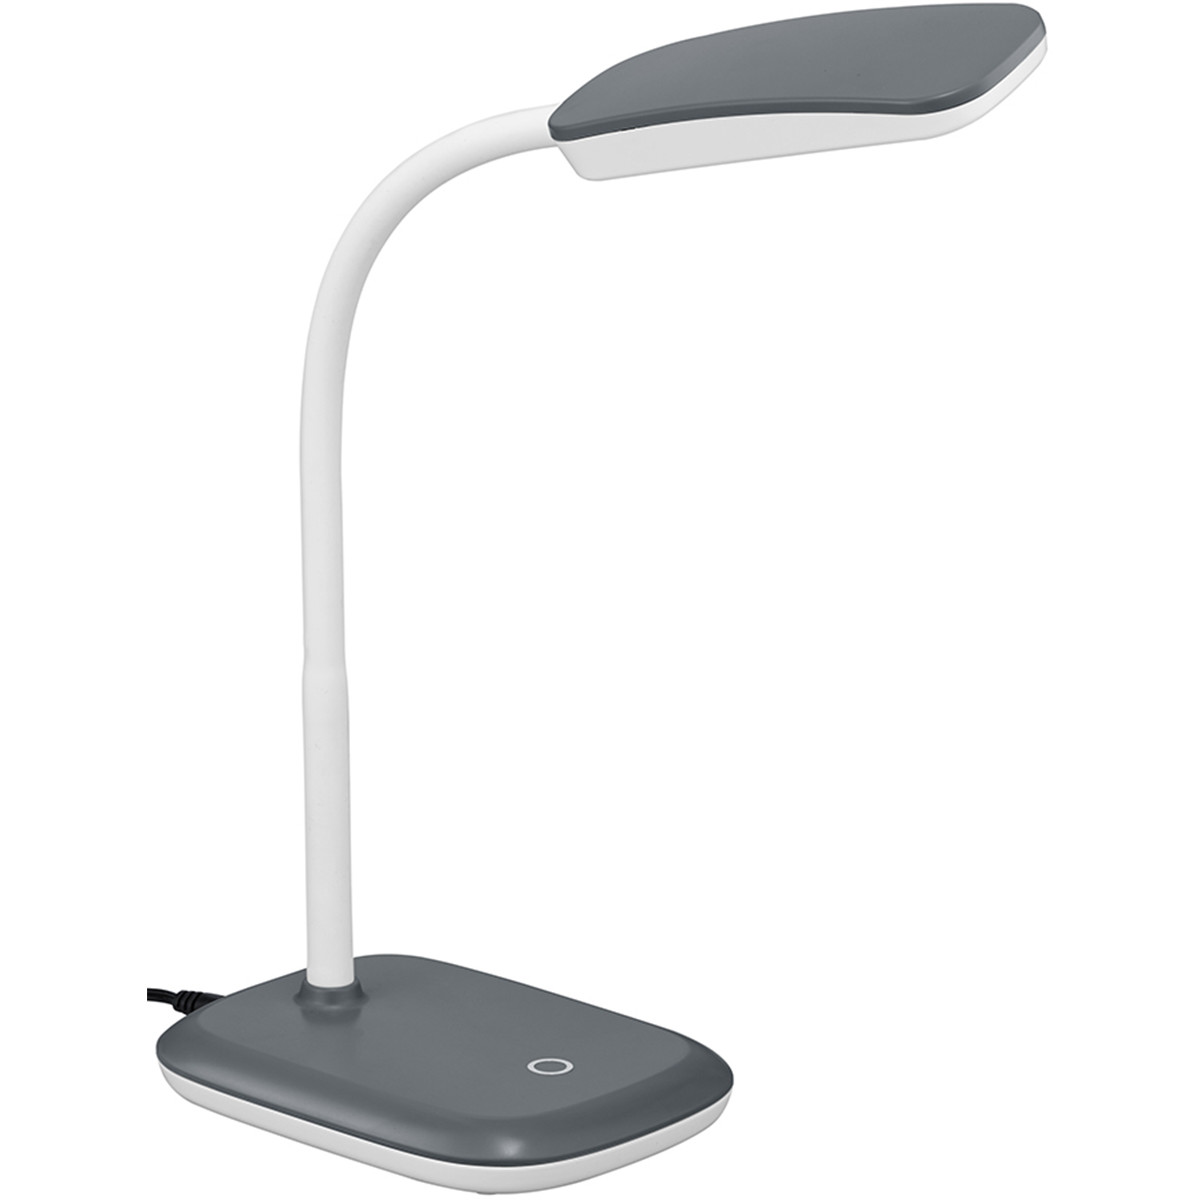 LED Tafellamp - Trion Bolina - 3W - Warm Wit 3000K - Dimbaar - Rechthoek - Glans